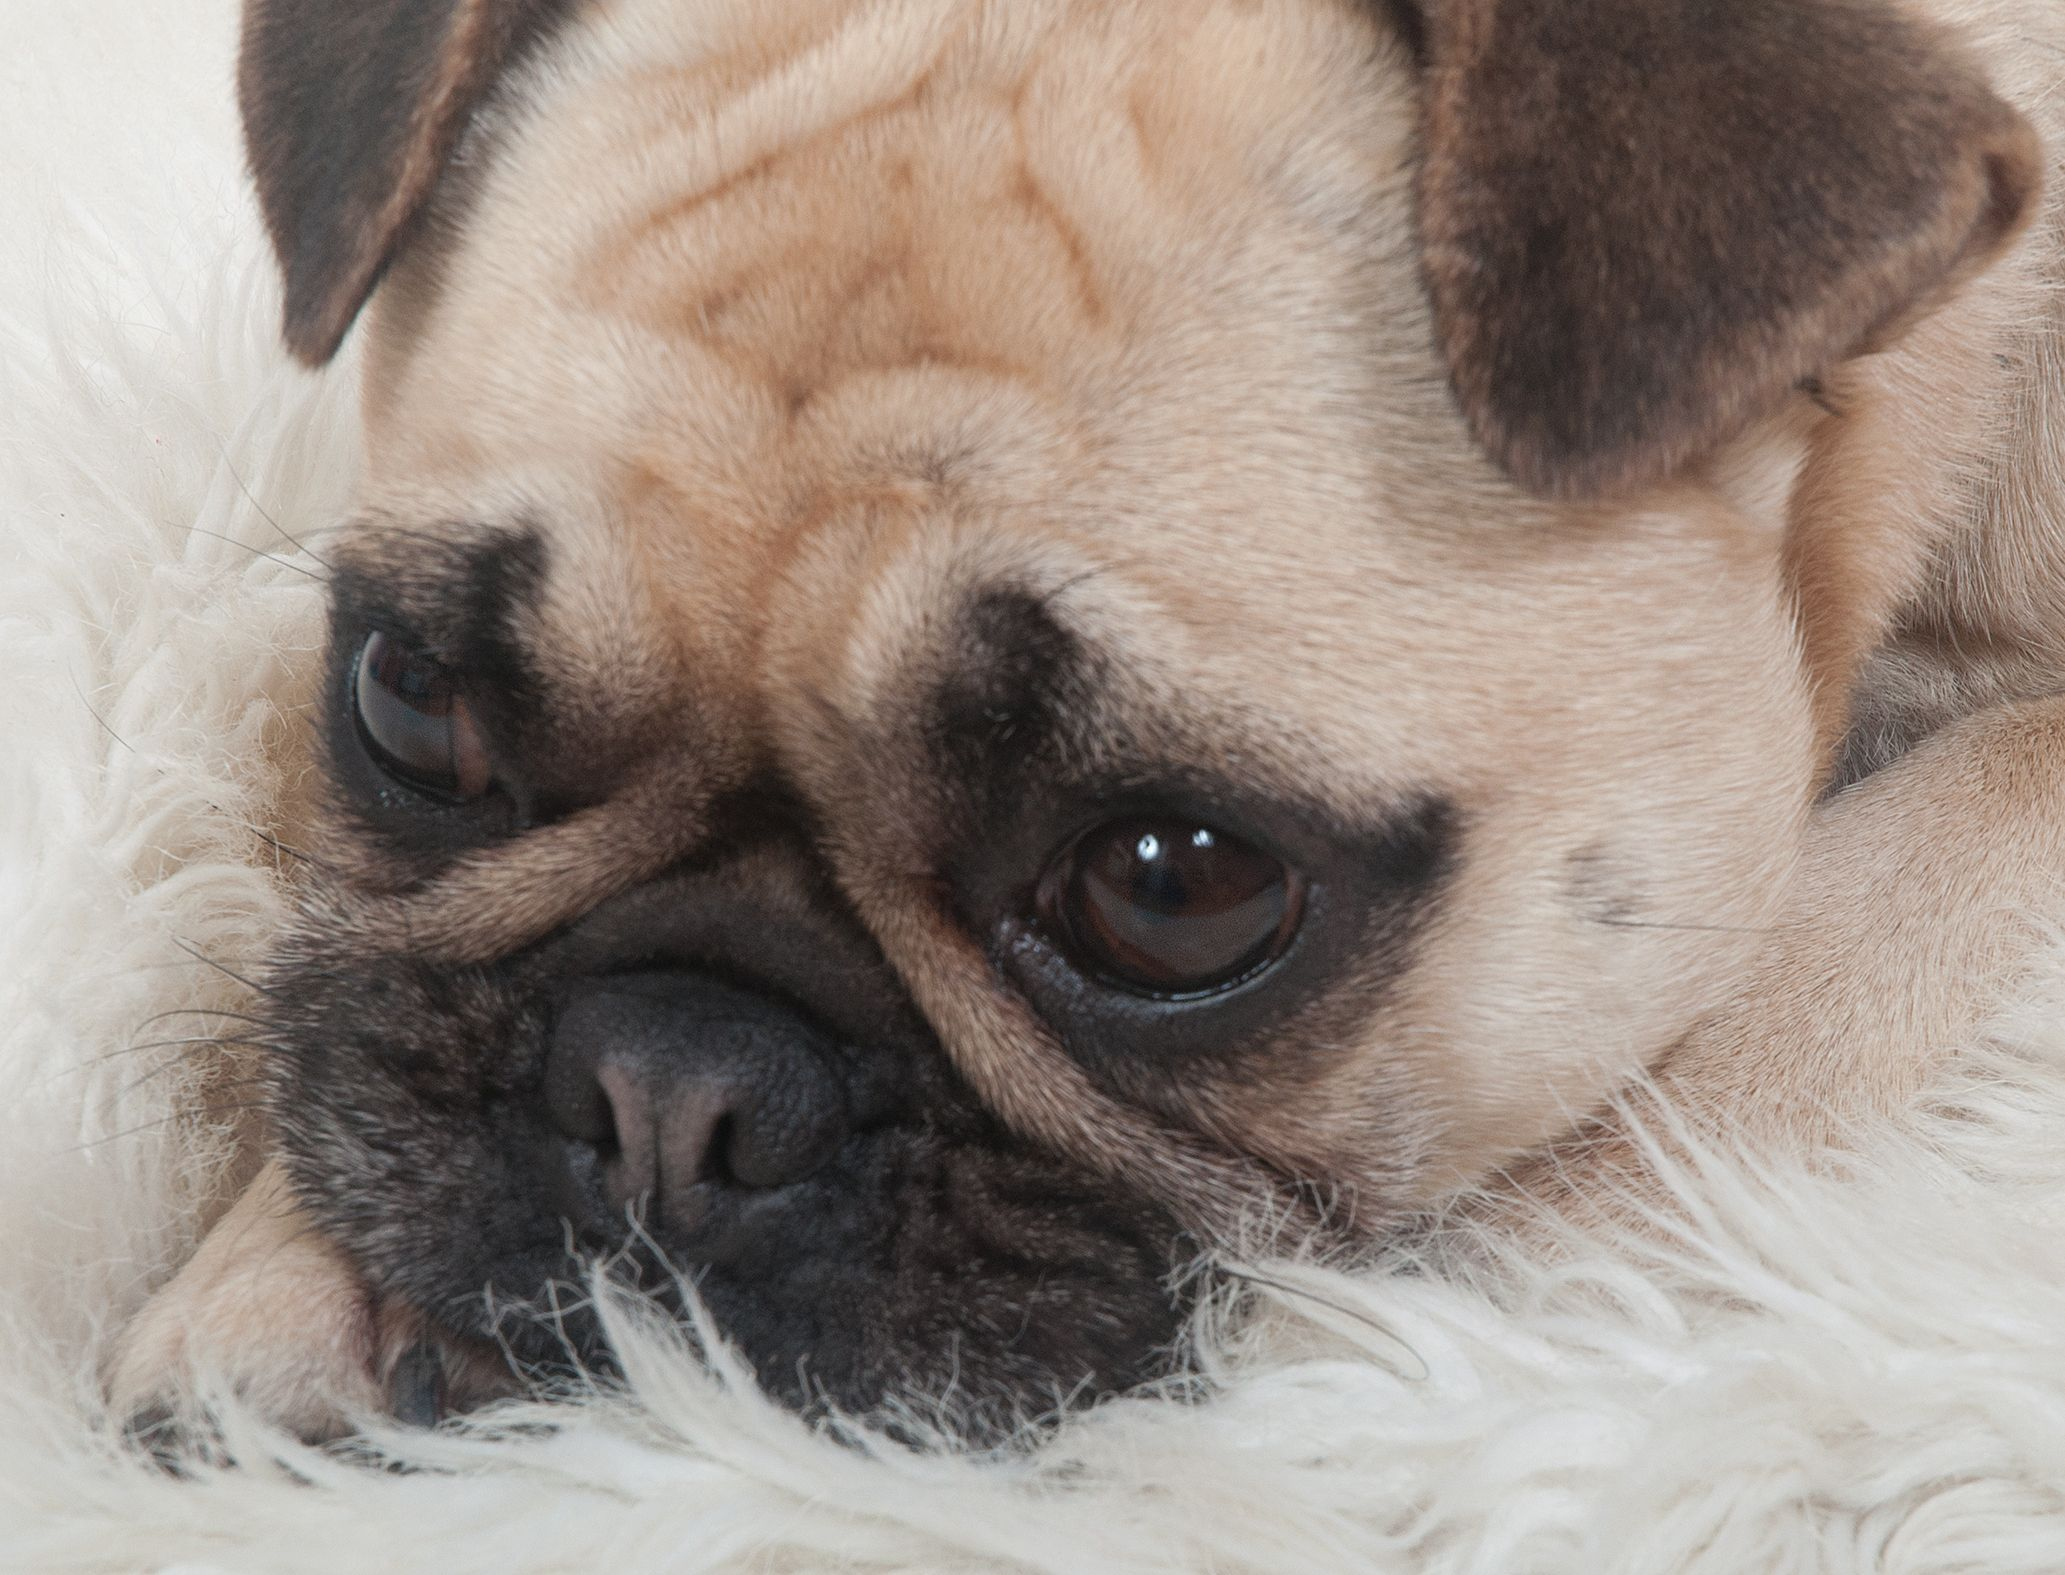 #frug #pug #frenchbulldog #frenchie #frenchiepug #dogsofinstagram #dog #frenchiesofinstagram #pugsofinstagram #puglife #squishyfacecrew #bulldog #petsofinstagram #puppylove #instagramdogs #fruglife #frugsofinstagram #fruglove #photographernorthlondon #herrickphoto